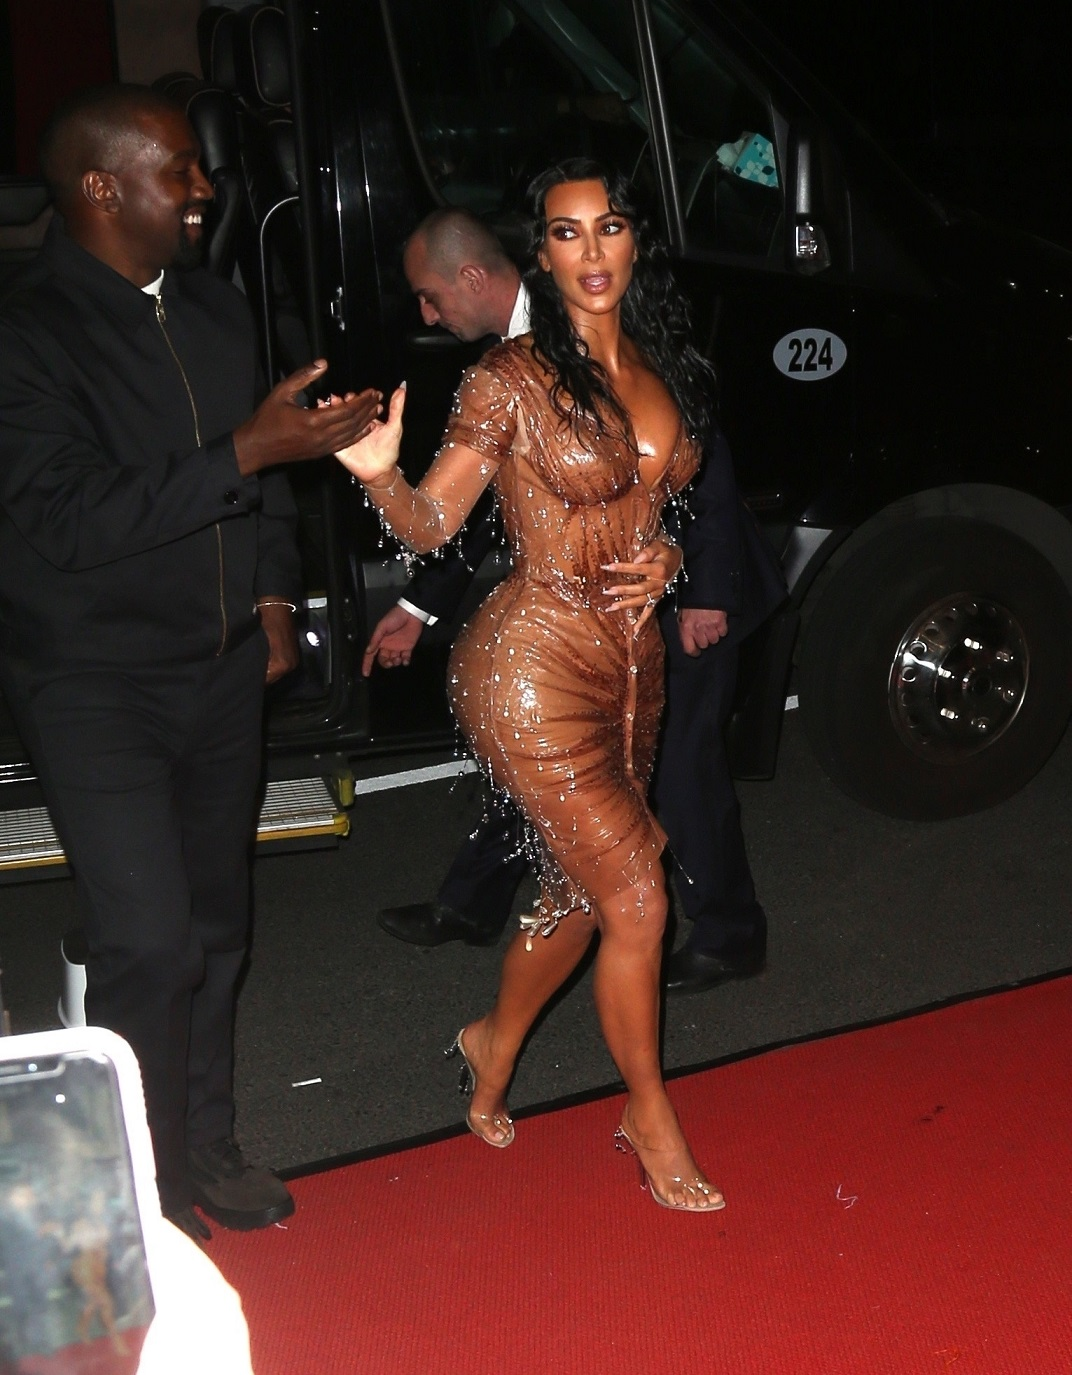 Kim Kardashian and Kanye West return to their hotel after the Met Gala Kim Kardashian, Kanye West